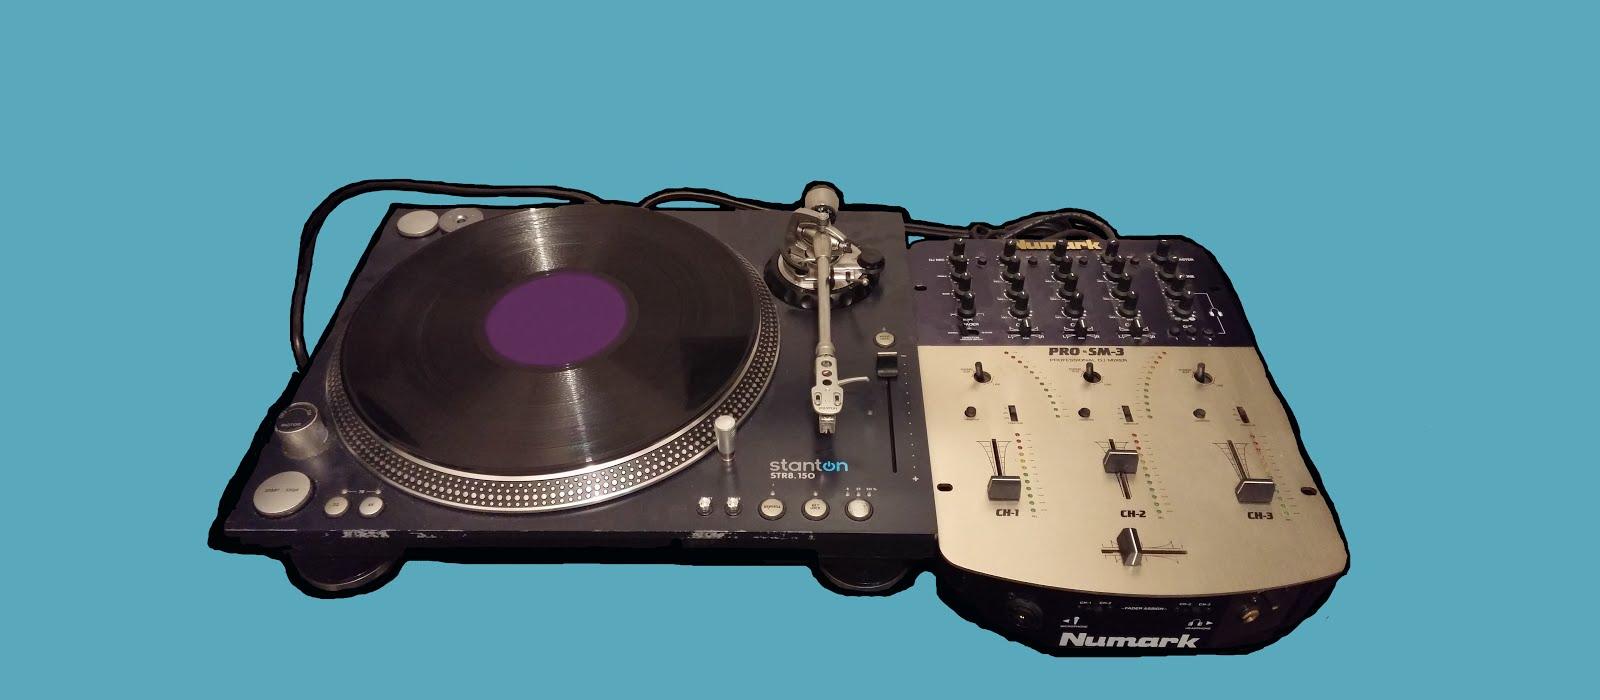 turntable mixer